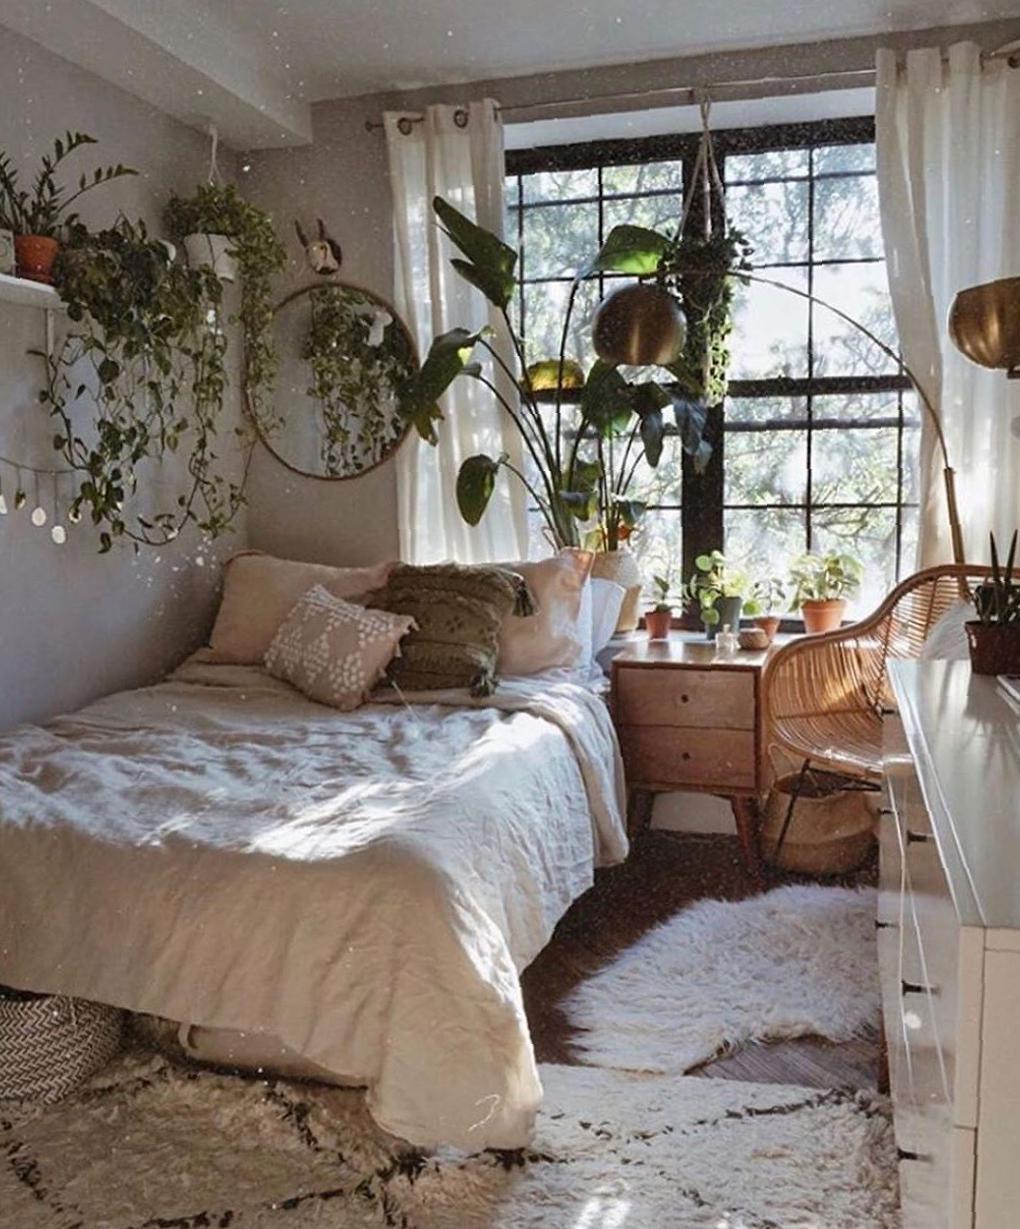 35 Extraordinary Bedroom Design Ideas For Comfortable Home bedroom design ideas,modern bedroom design,bedroom design for couples,dream rooms,simple bedroom design,industrial bedroom design,bedroom design for girls